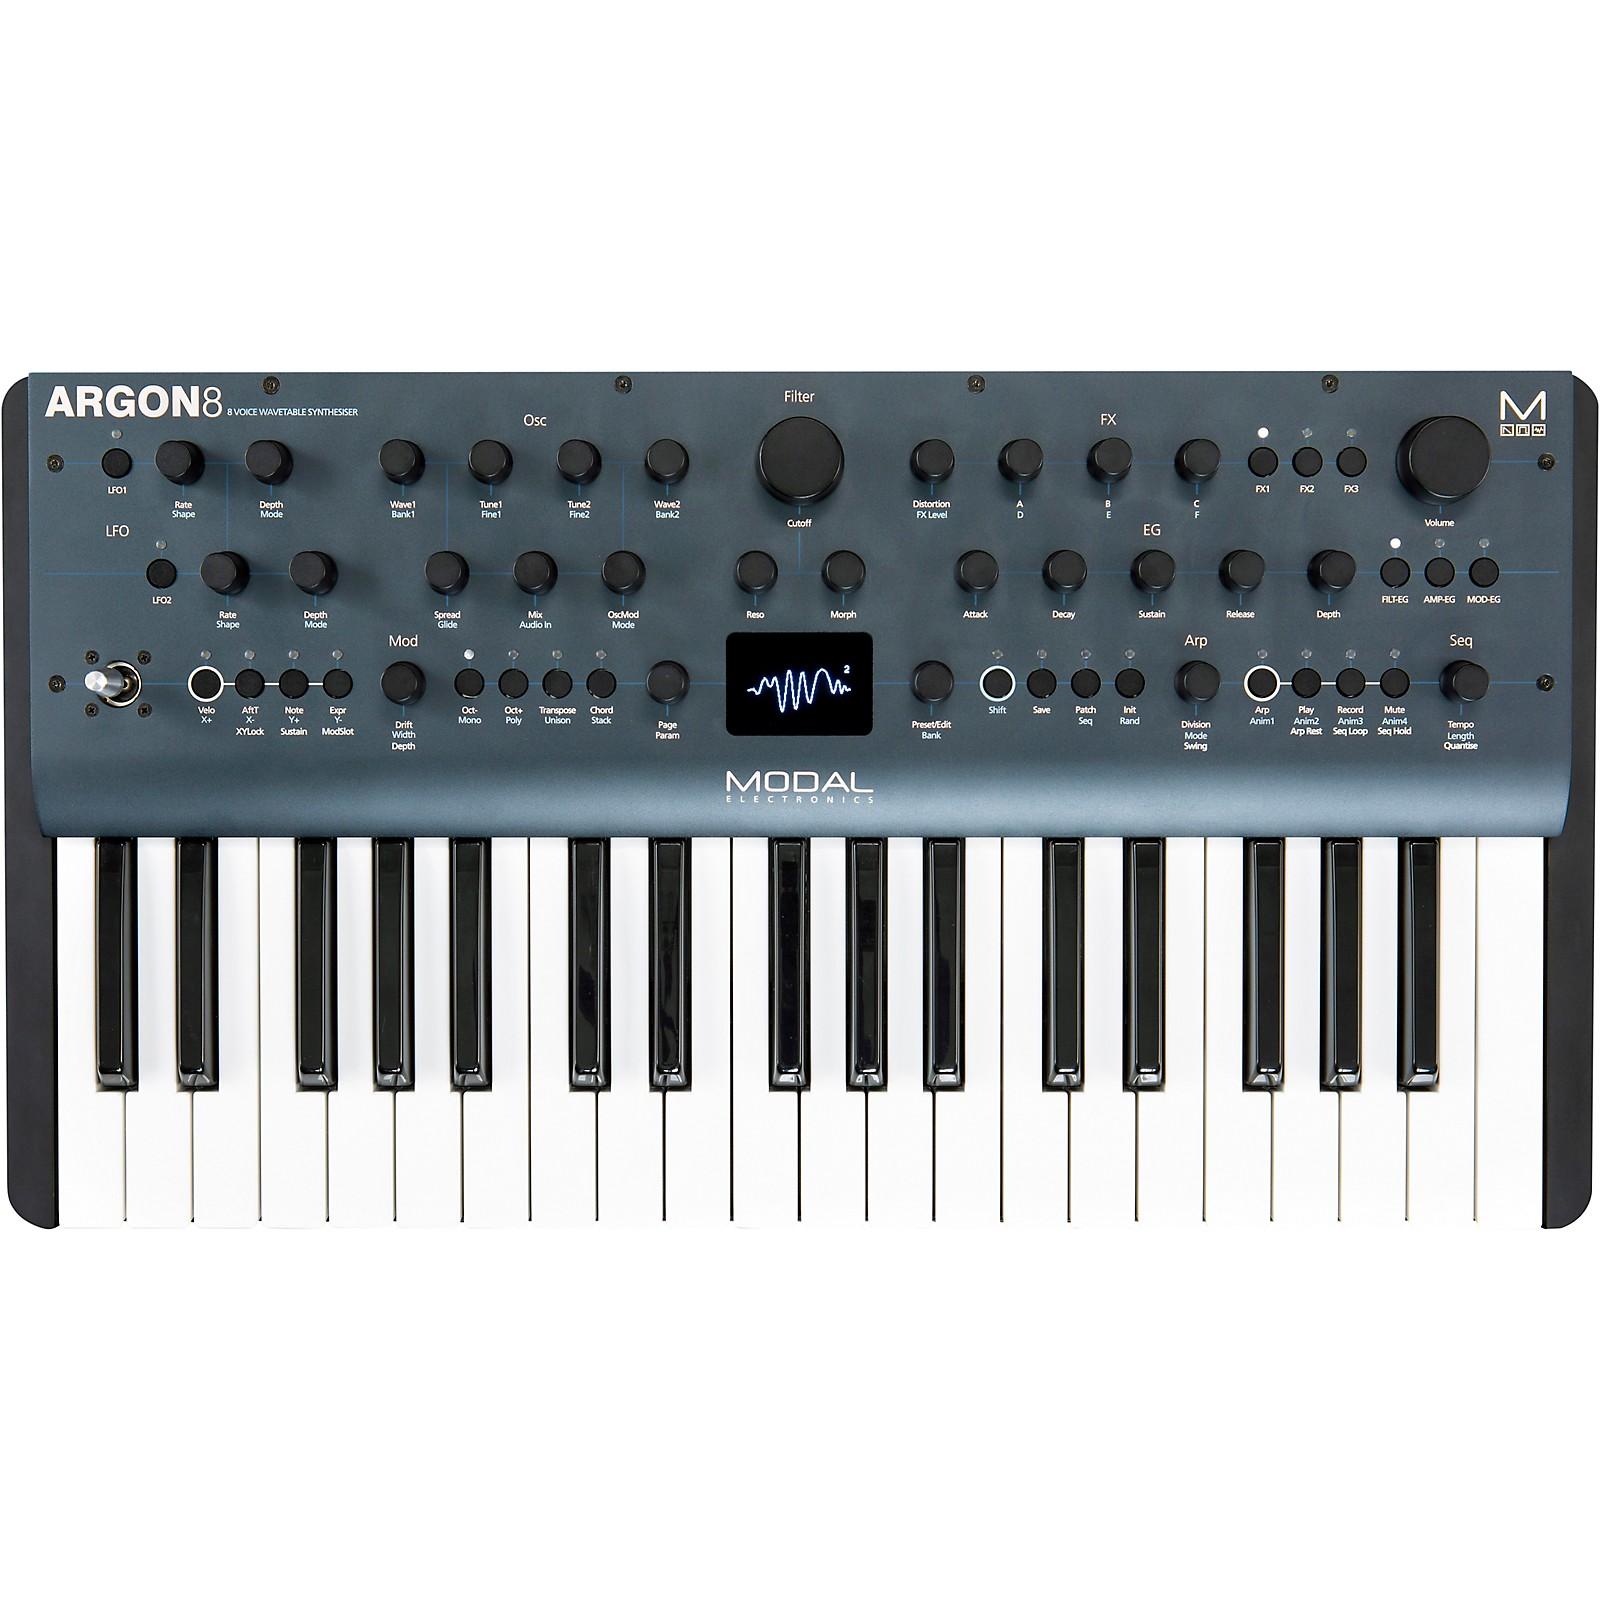 Modal Electronics Limited Argon8 37-Key 8-Voice Polyphonic Wavetable Synthesizer